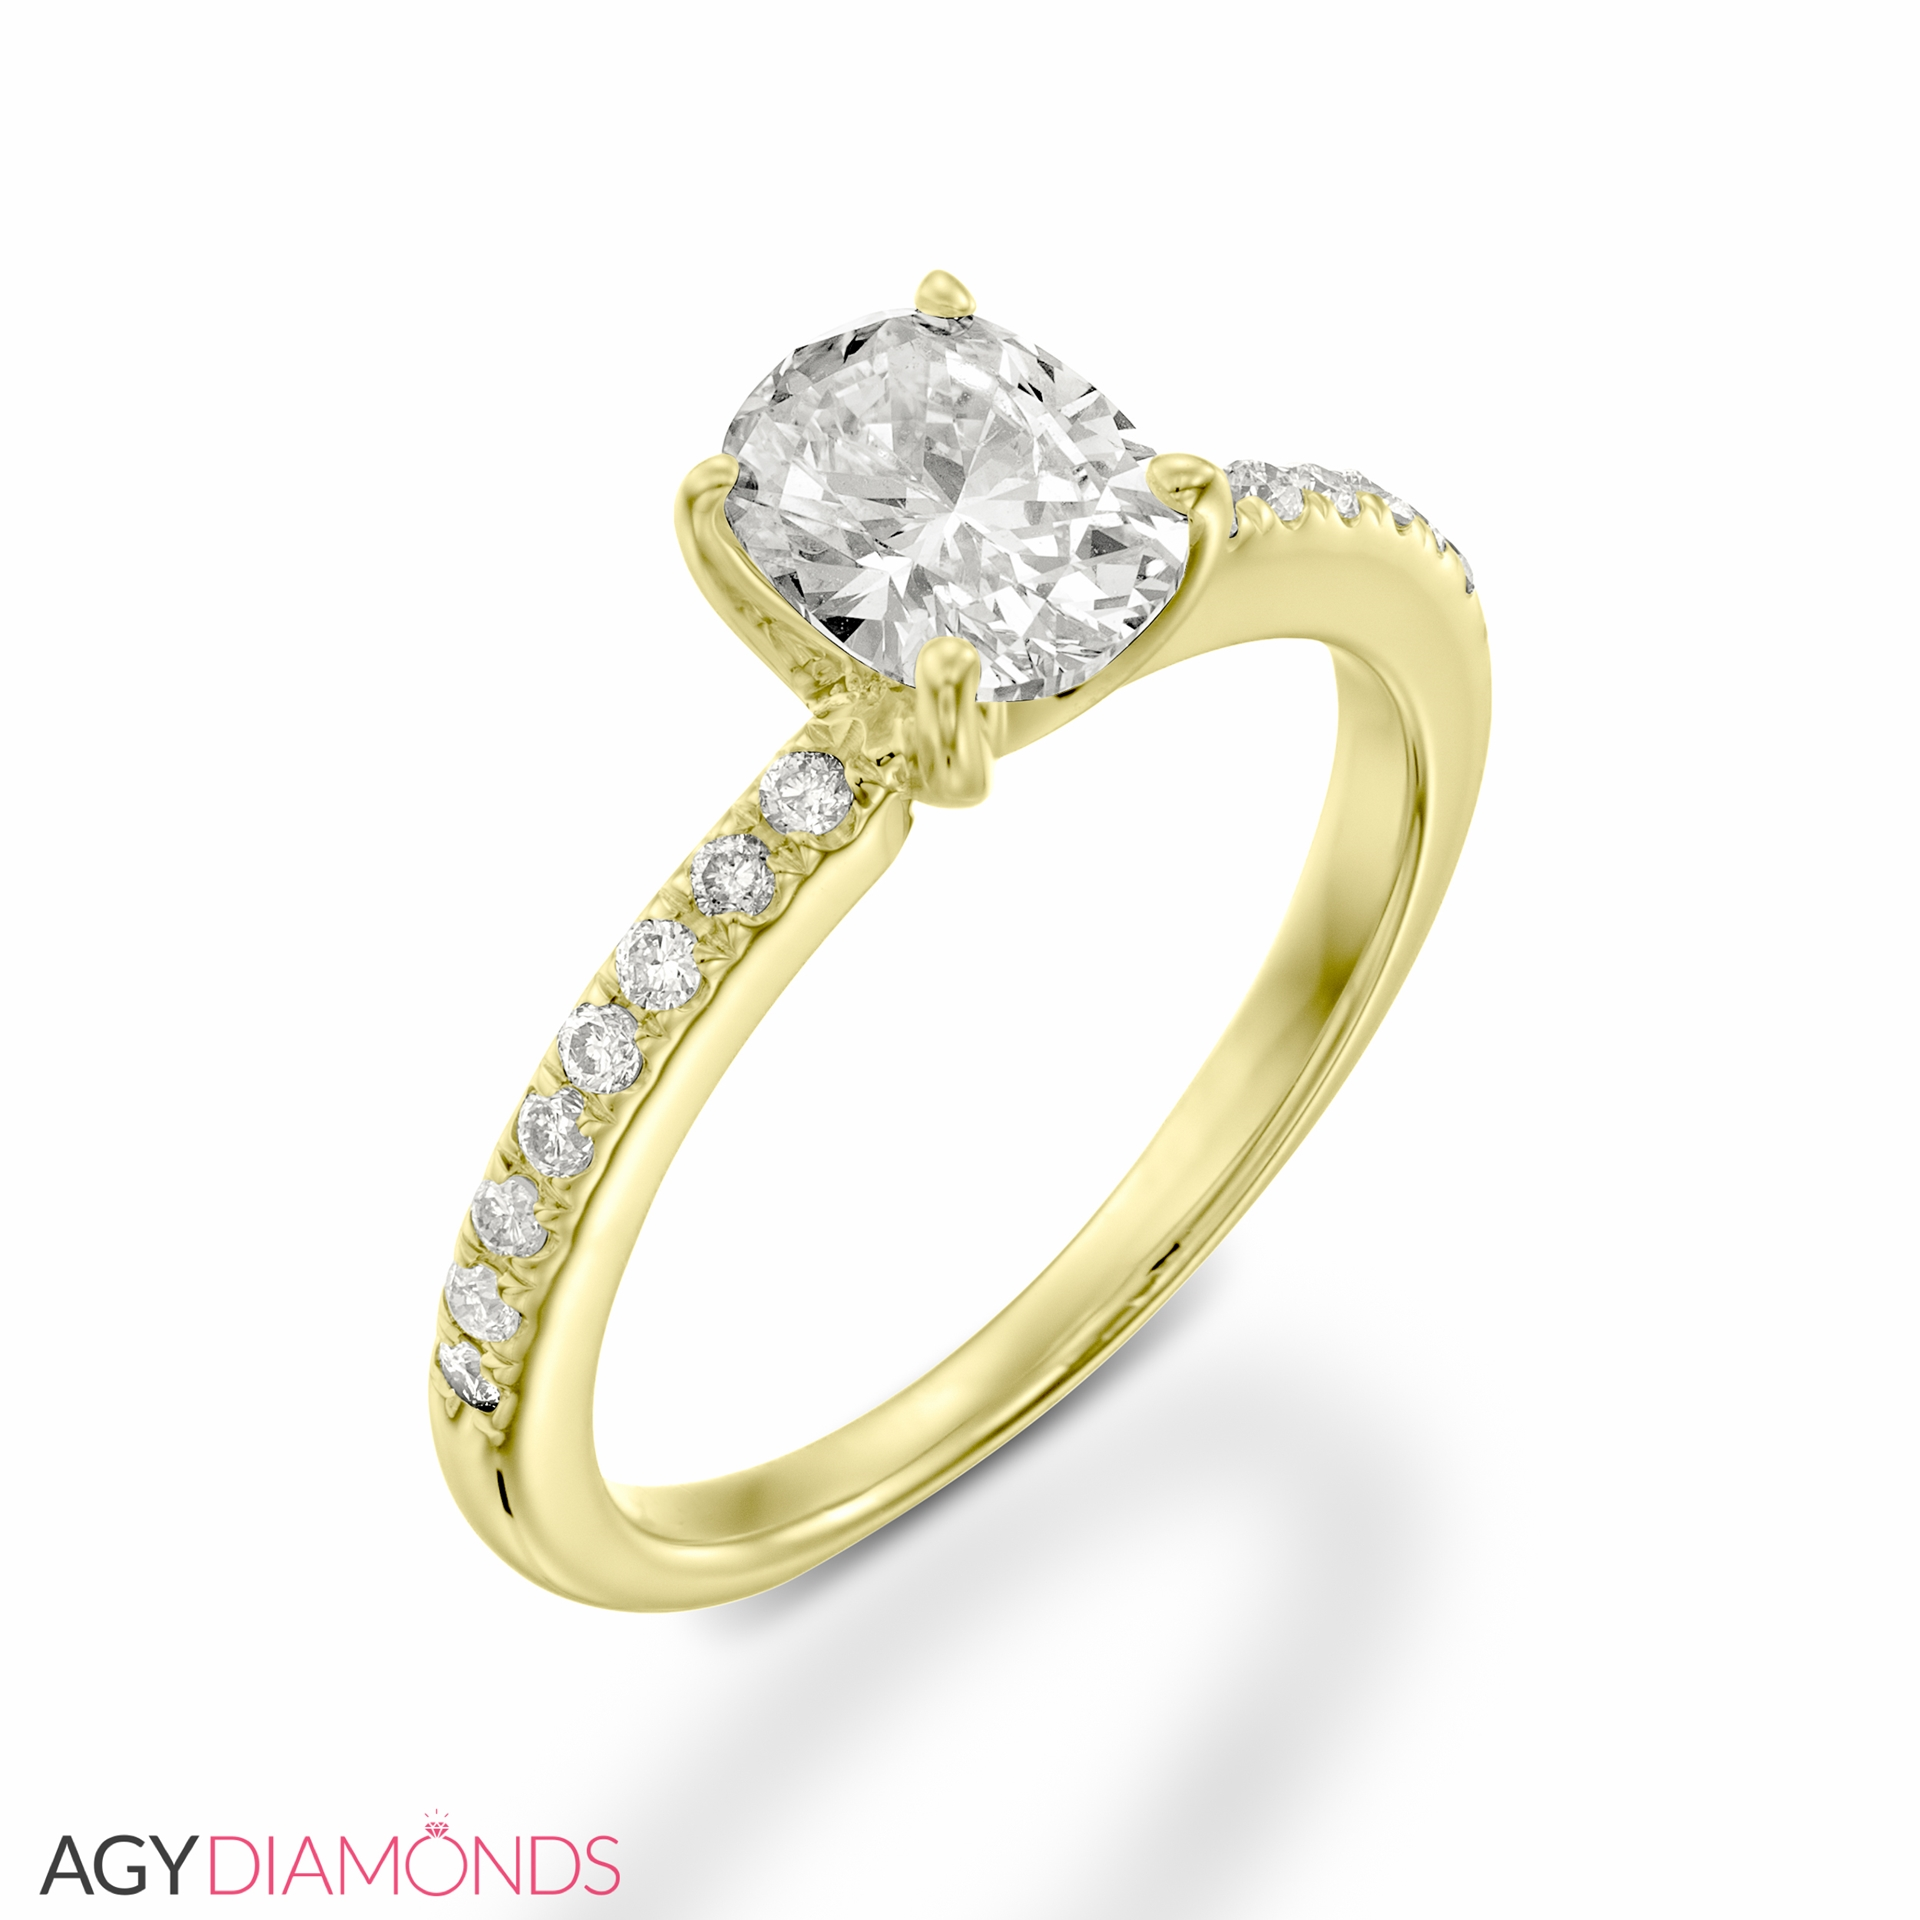 041 total carat classic engagement oval diamond ring agy diamonds picture of 041 total carat classic engagement oval diamond ring junglespirit Choice Image